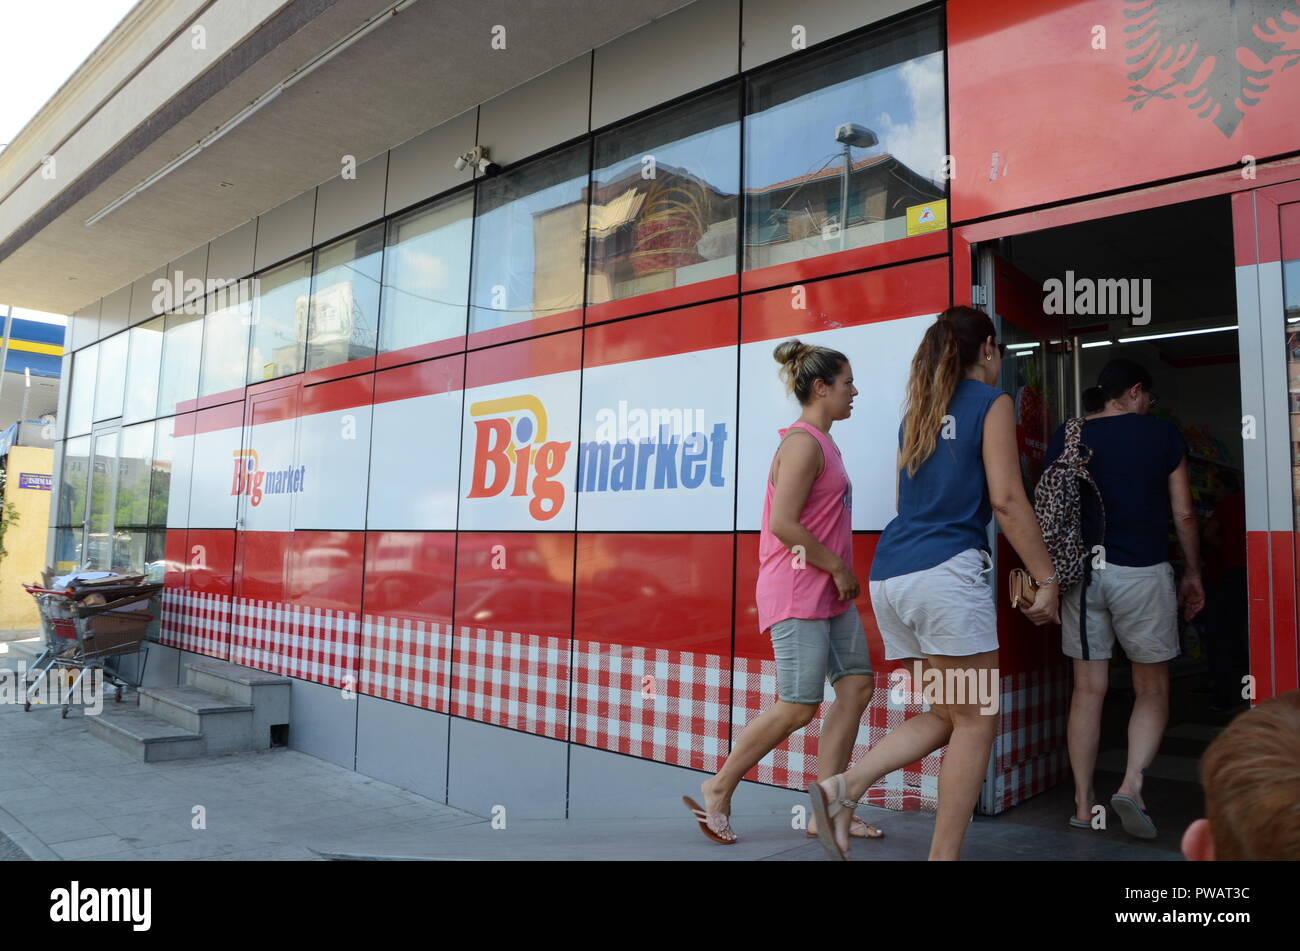 big market supermarket shkoder albania Stock Photo